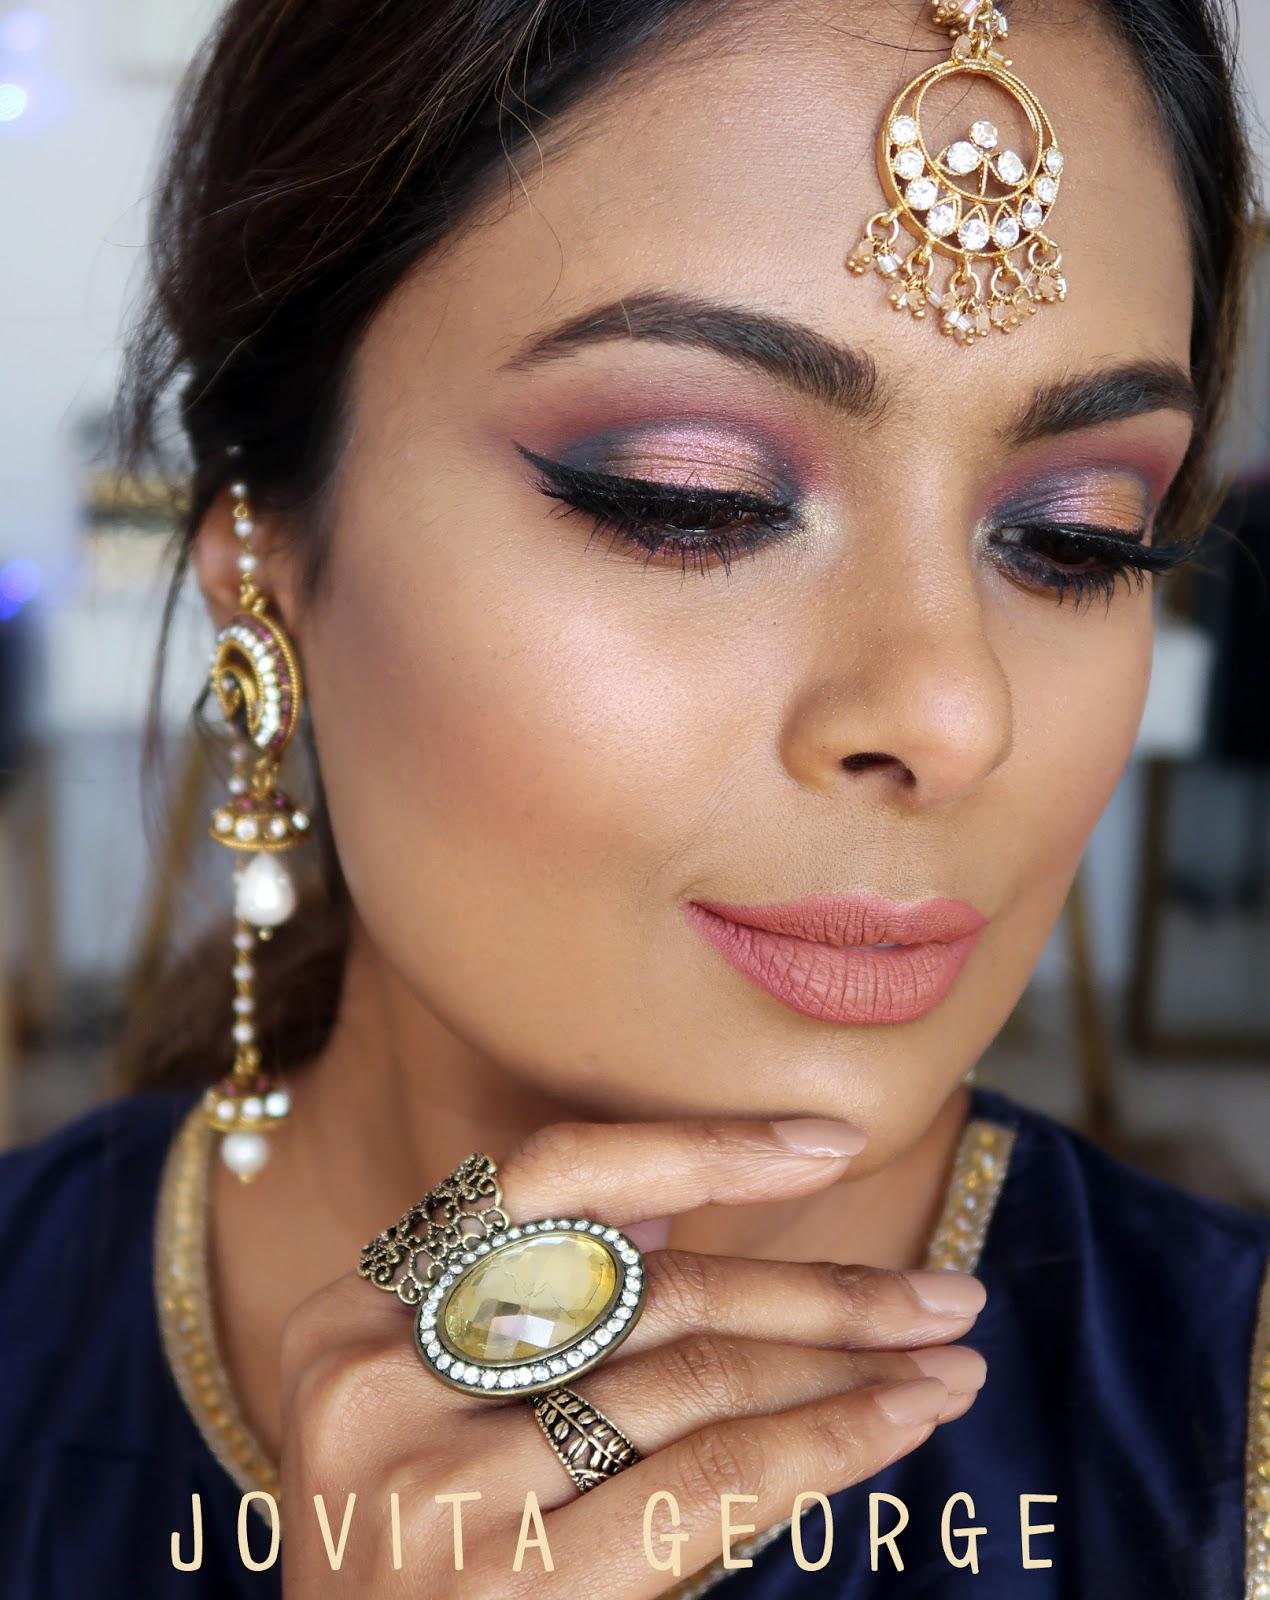 Beauty Blog Fashion Blog Kuwait Dubai India | Jovita George